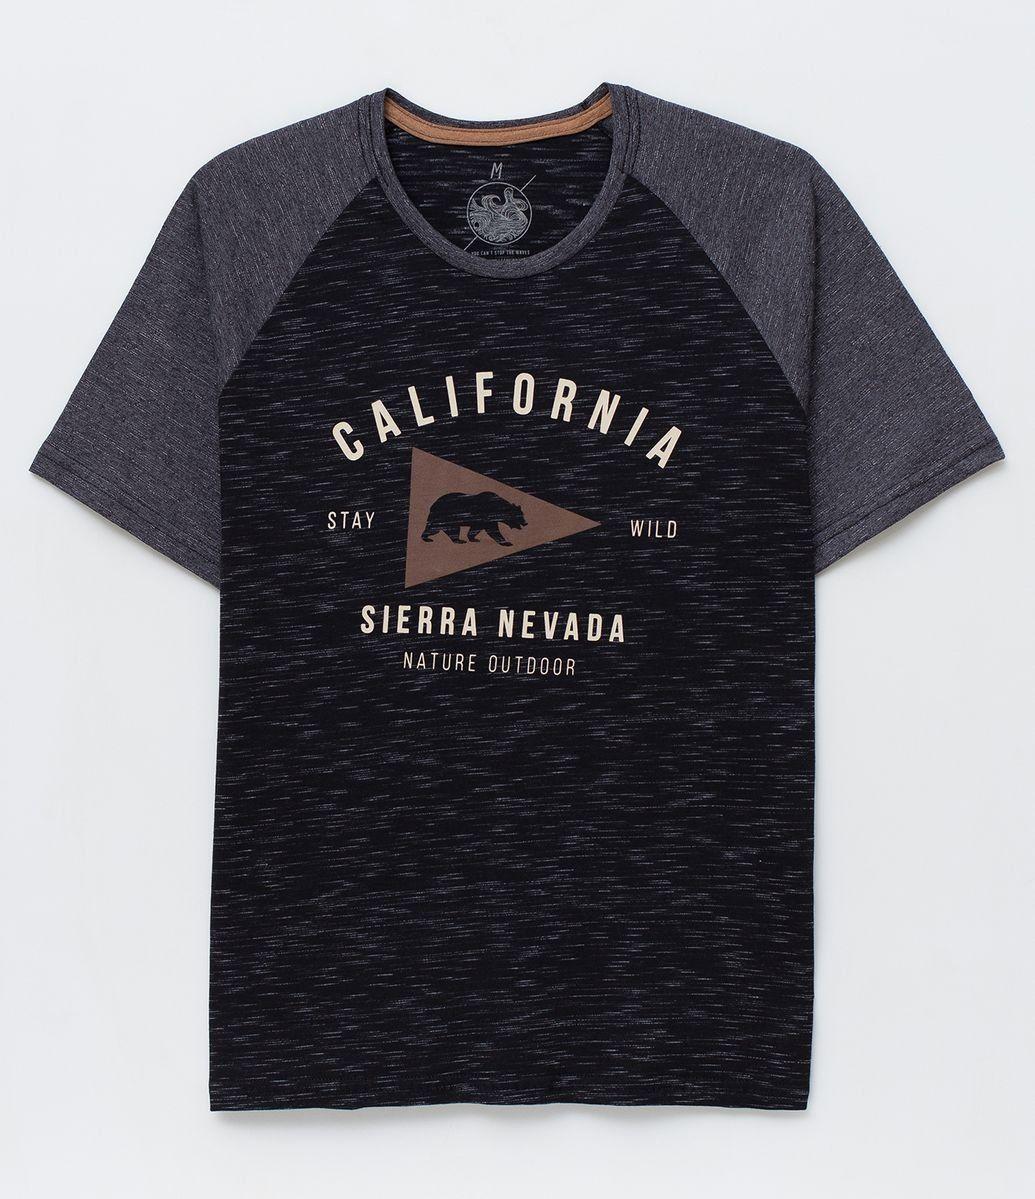 dffcff7da25 Camiseta Raglan com Estampa - Renner